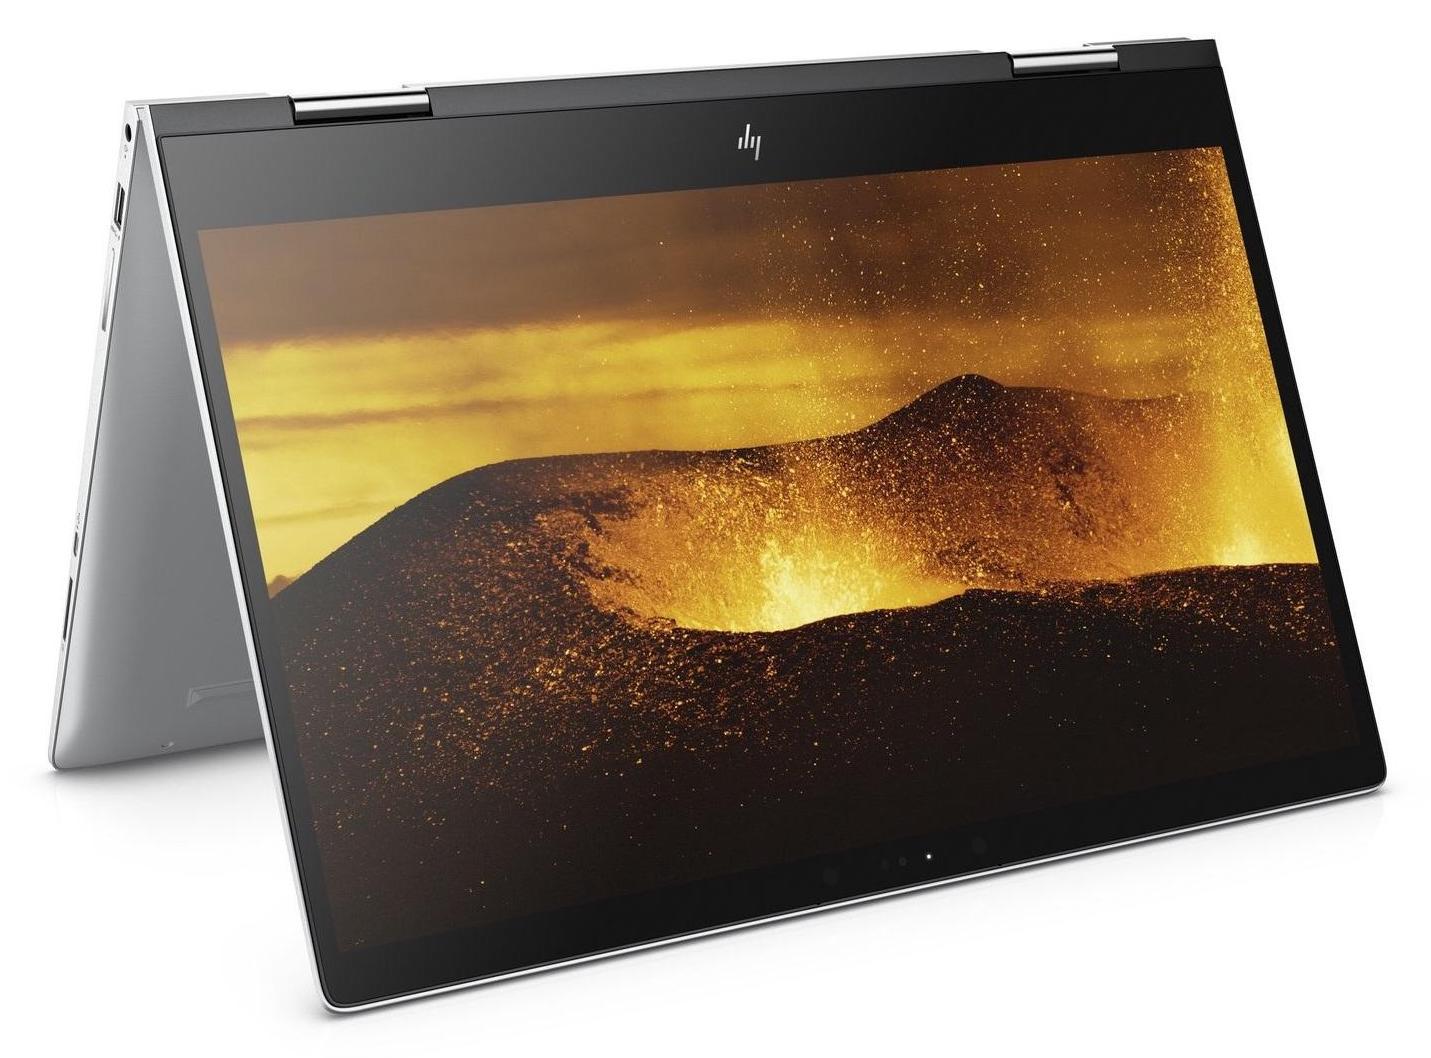 "HP Envy x360 15-bp121nf, ultrabook Tablette 15"" Quad i7 MX150 12Go (910€)"